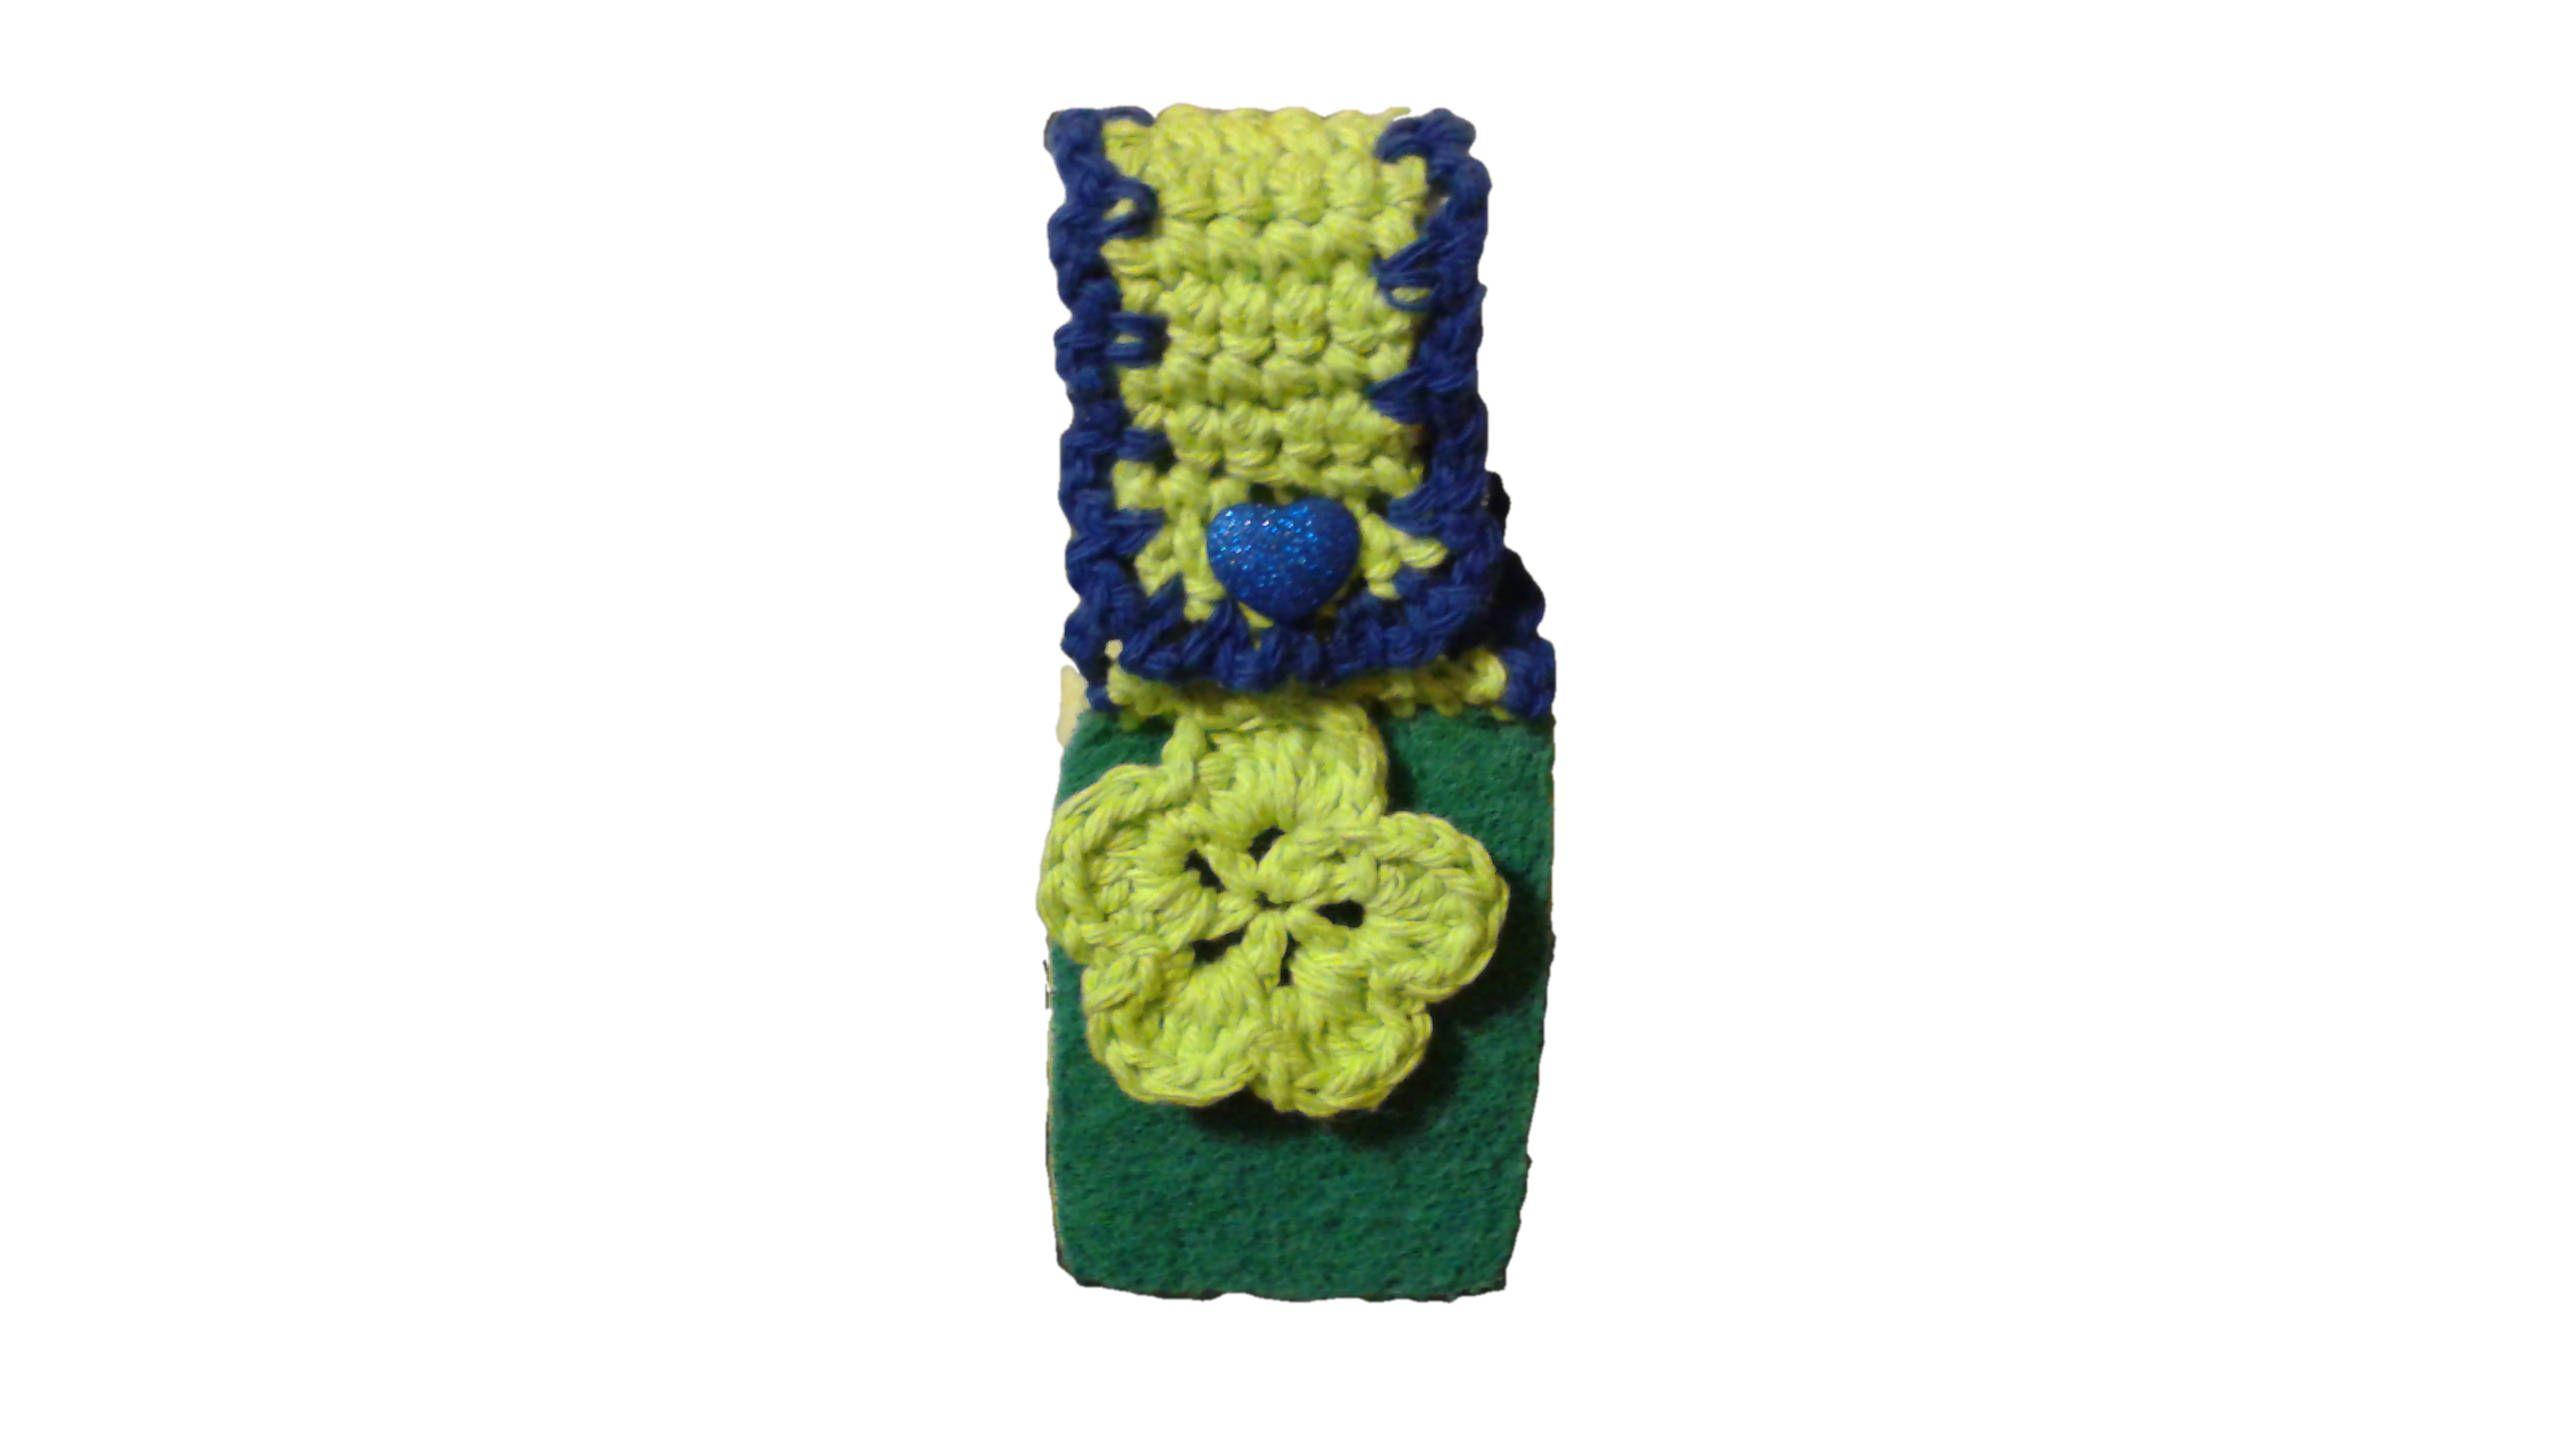 Kitchen Scrubbie Sponge-Reusable Sponge-Green and Blue Hanging Heart ...